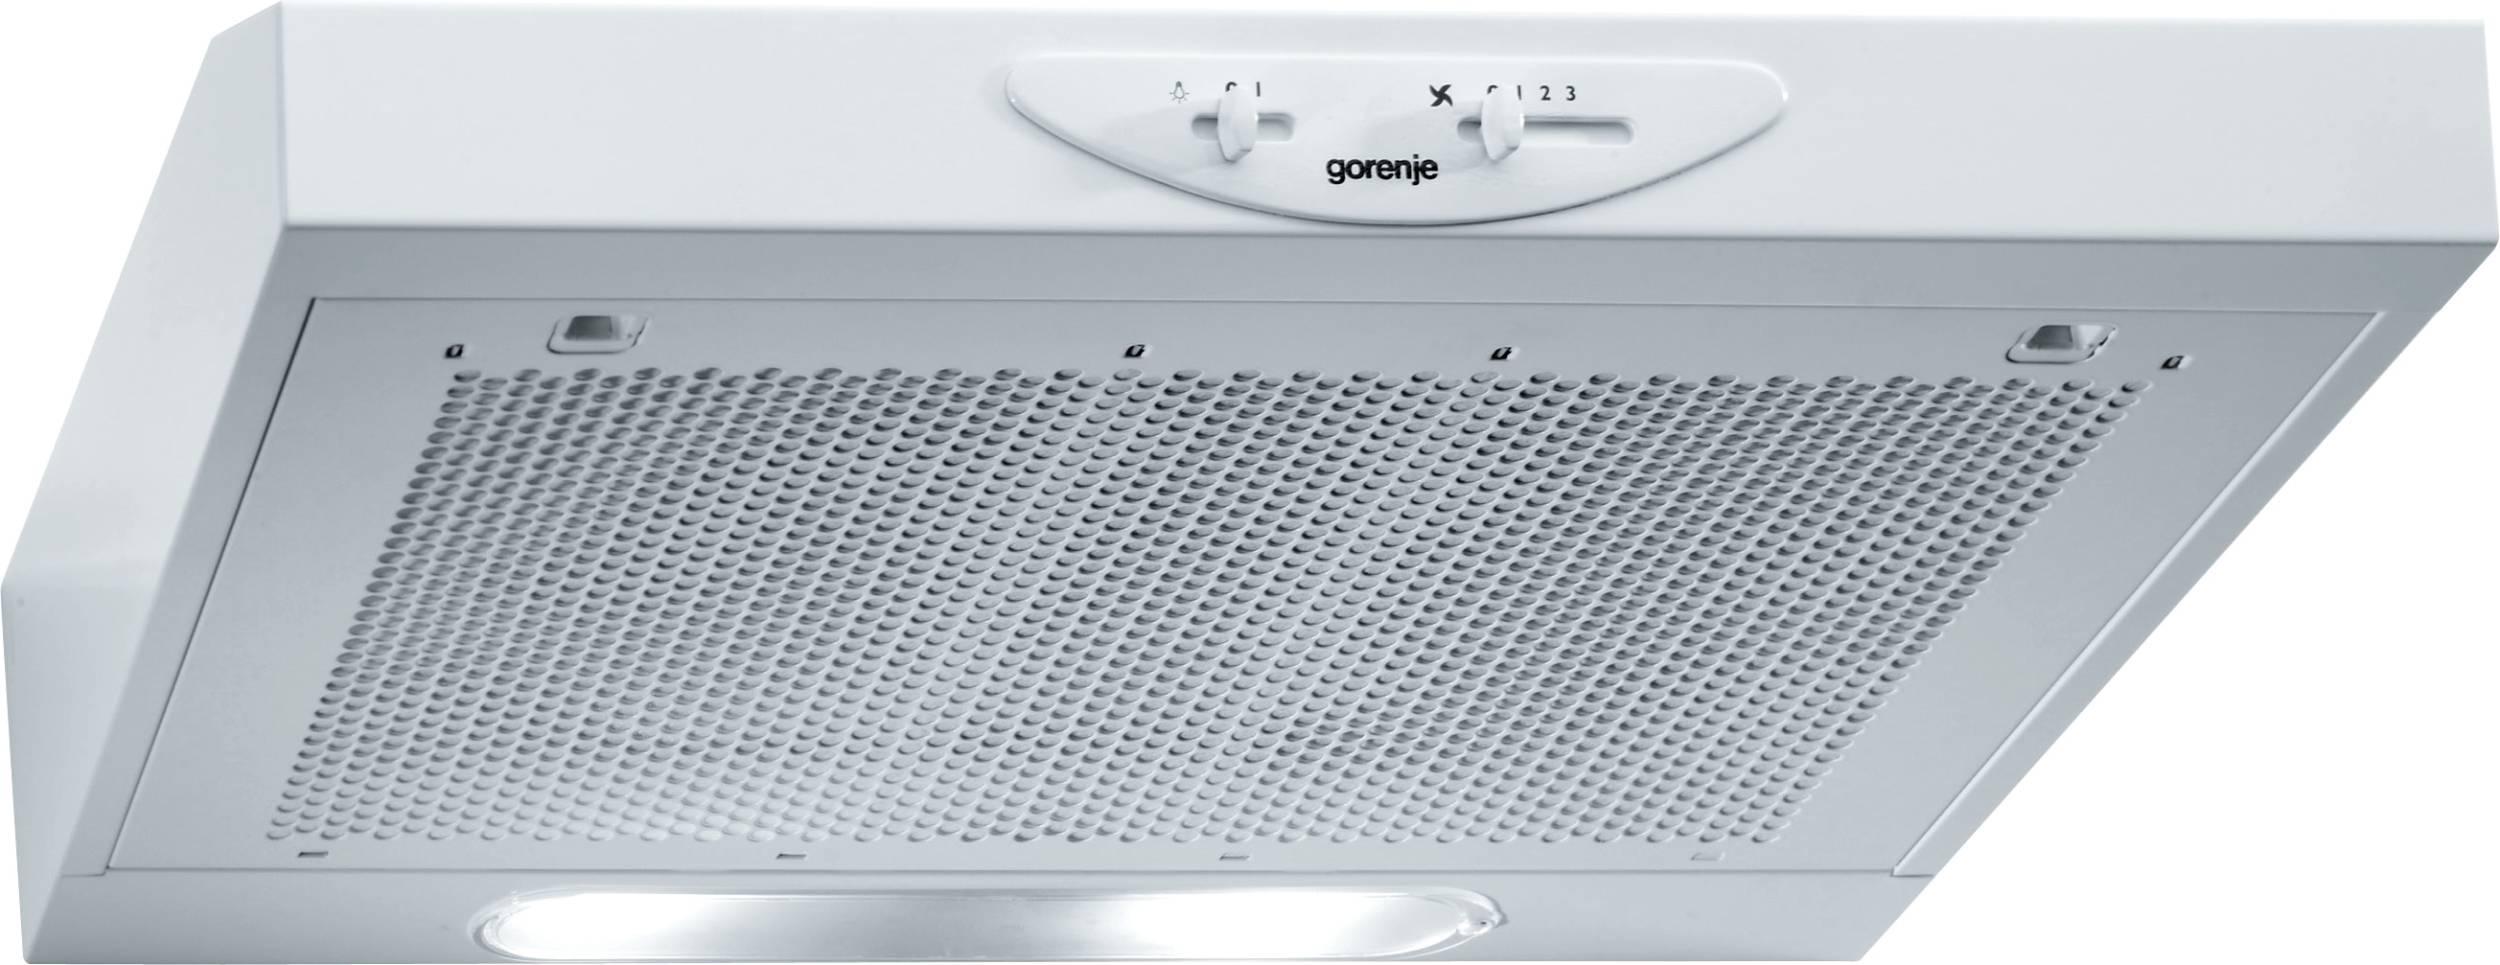 Gorenje DU611W Podugradni kuhinjski aspirator